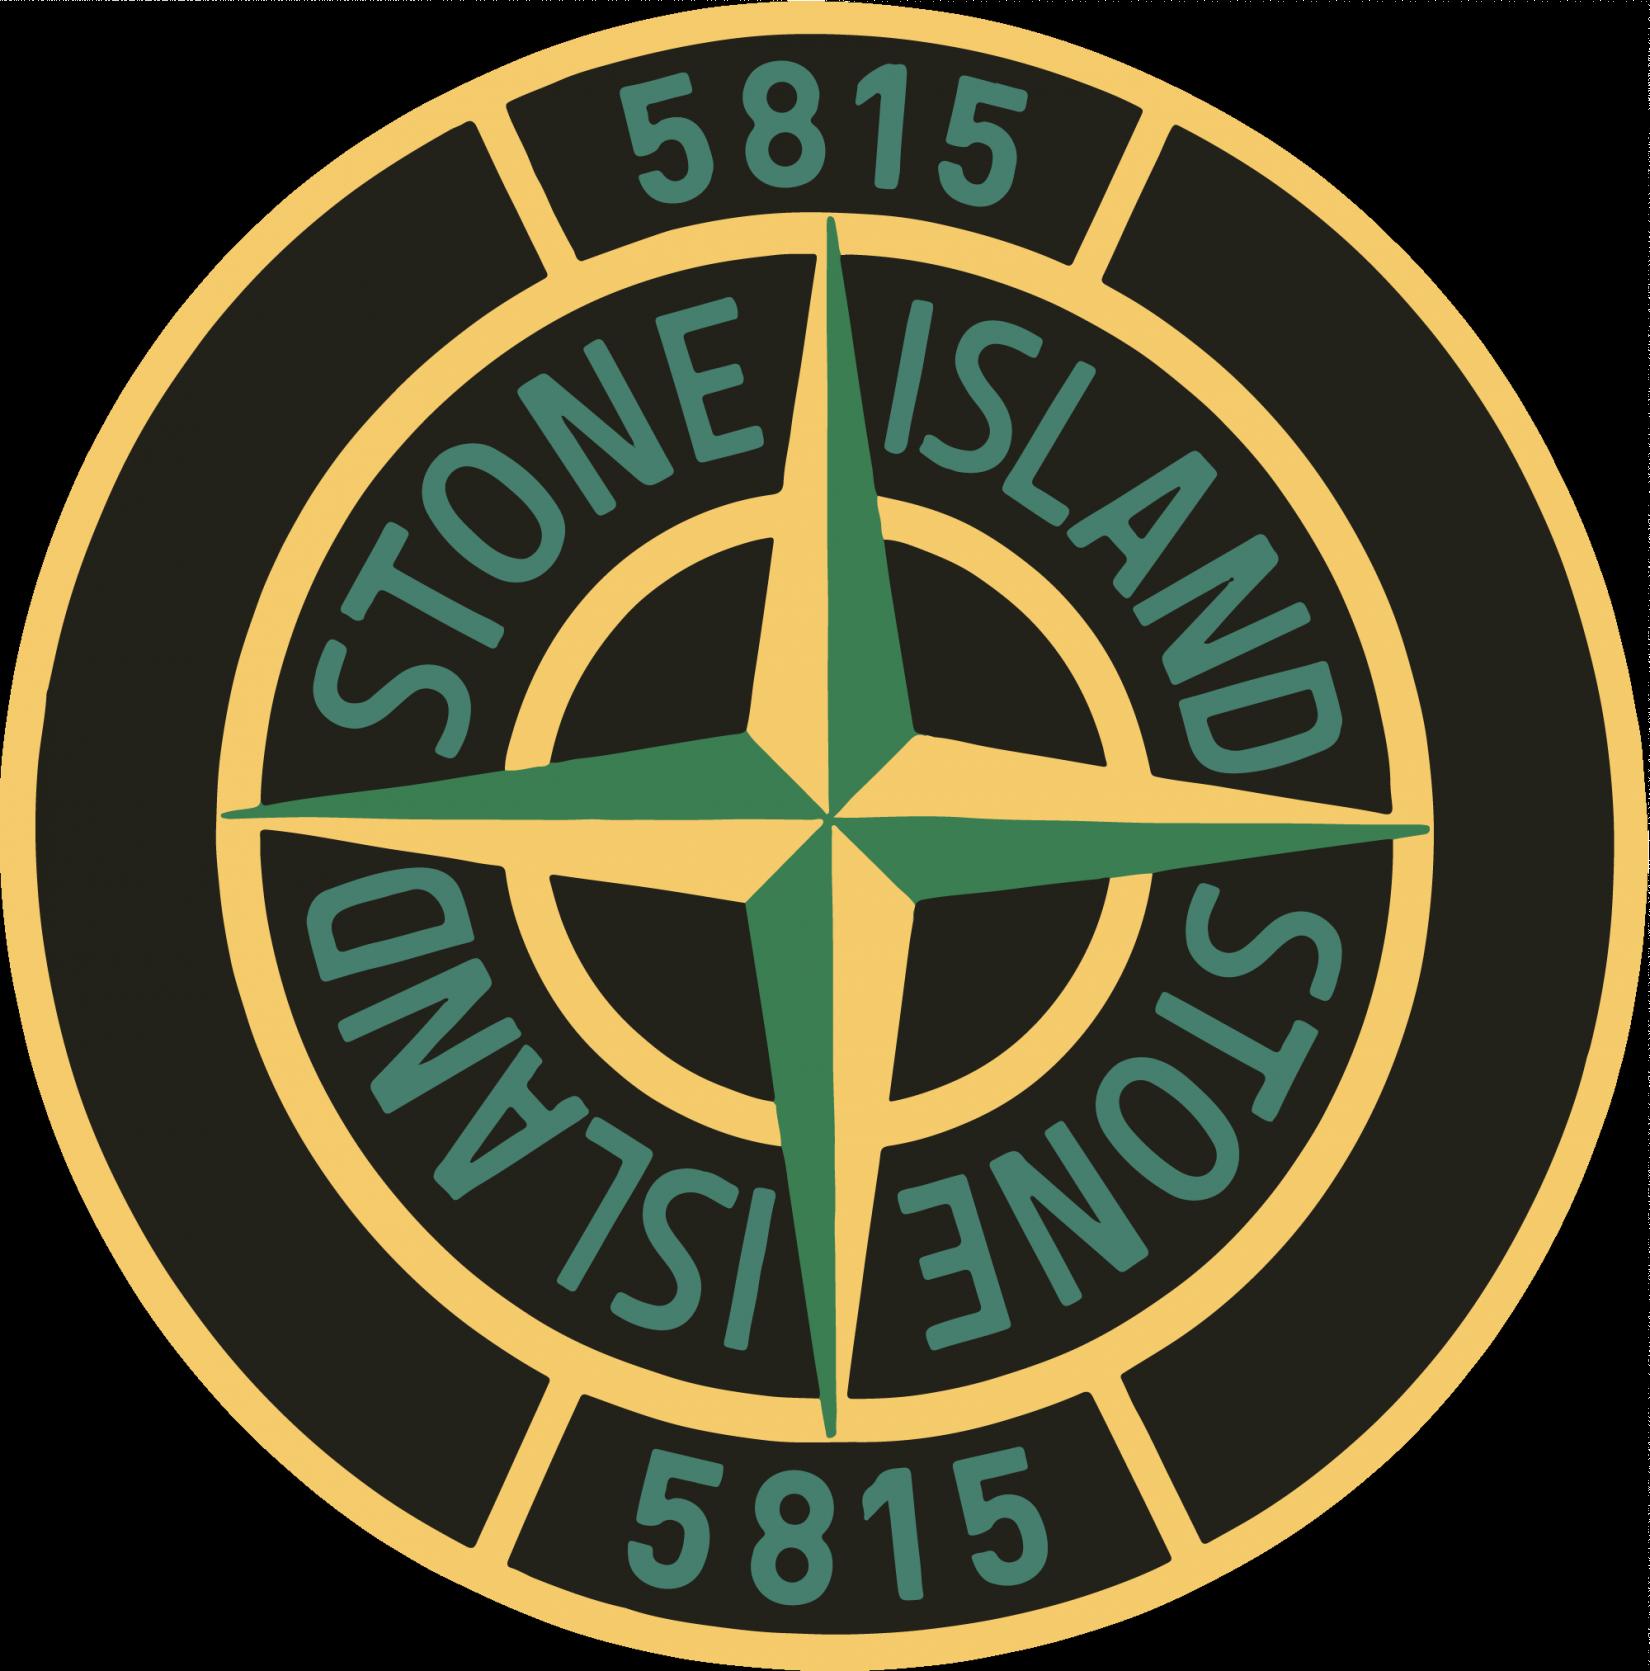 Stone Island Logo Google Search Desain Gambar Produk